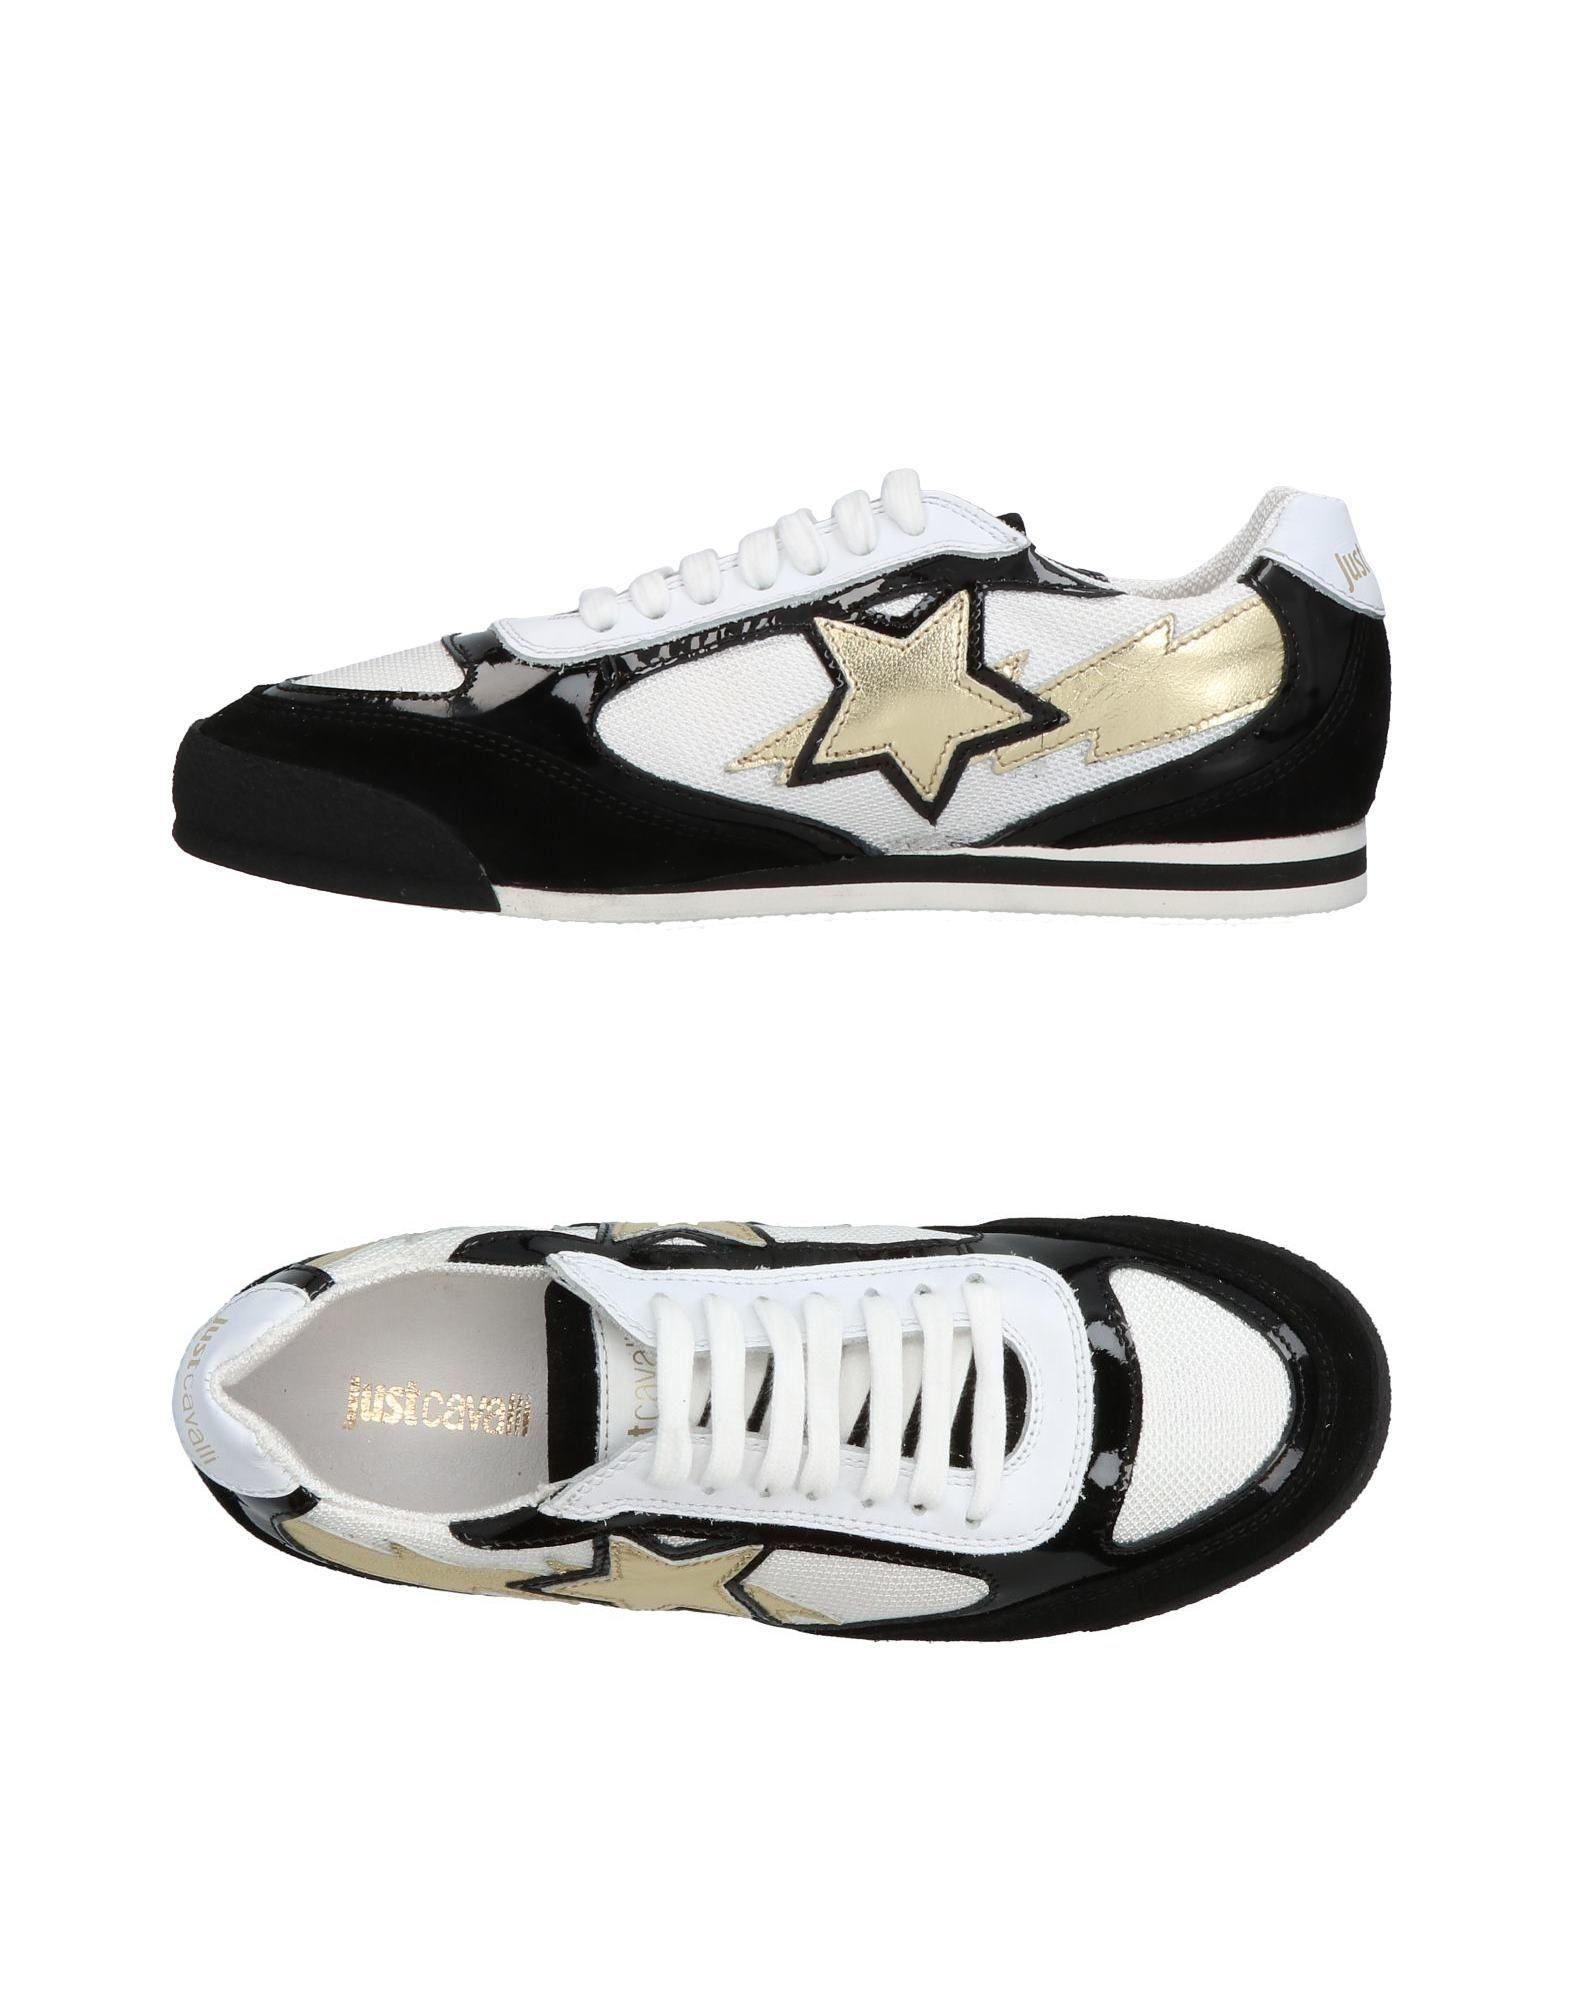 JUST CAVALLI Damen Low Sneakers & Tennisschuhe Farbe Schwarz Größe 9